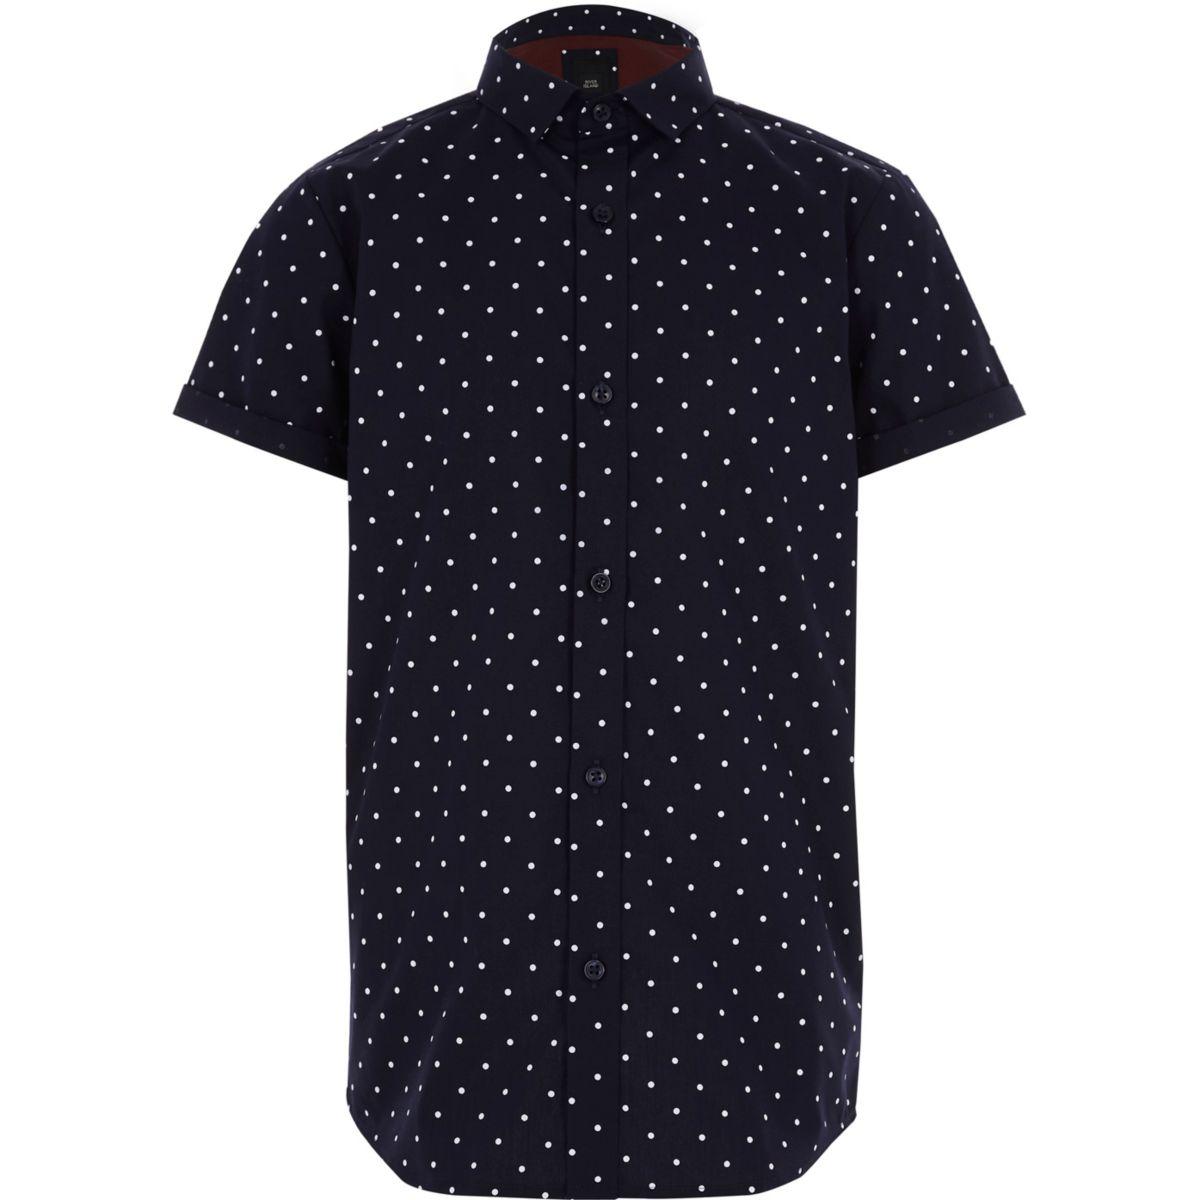 Boys Navy Polka Dot Short Sleeve Shirt Short Sleeve